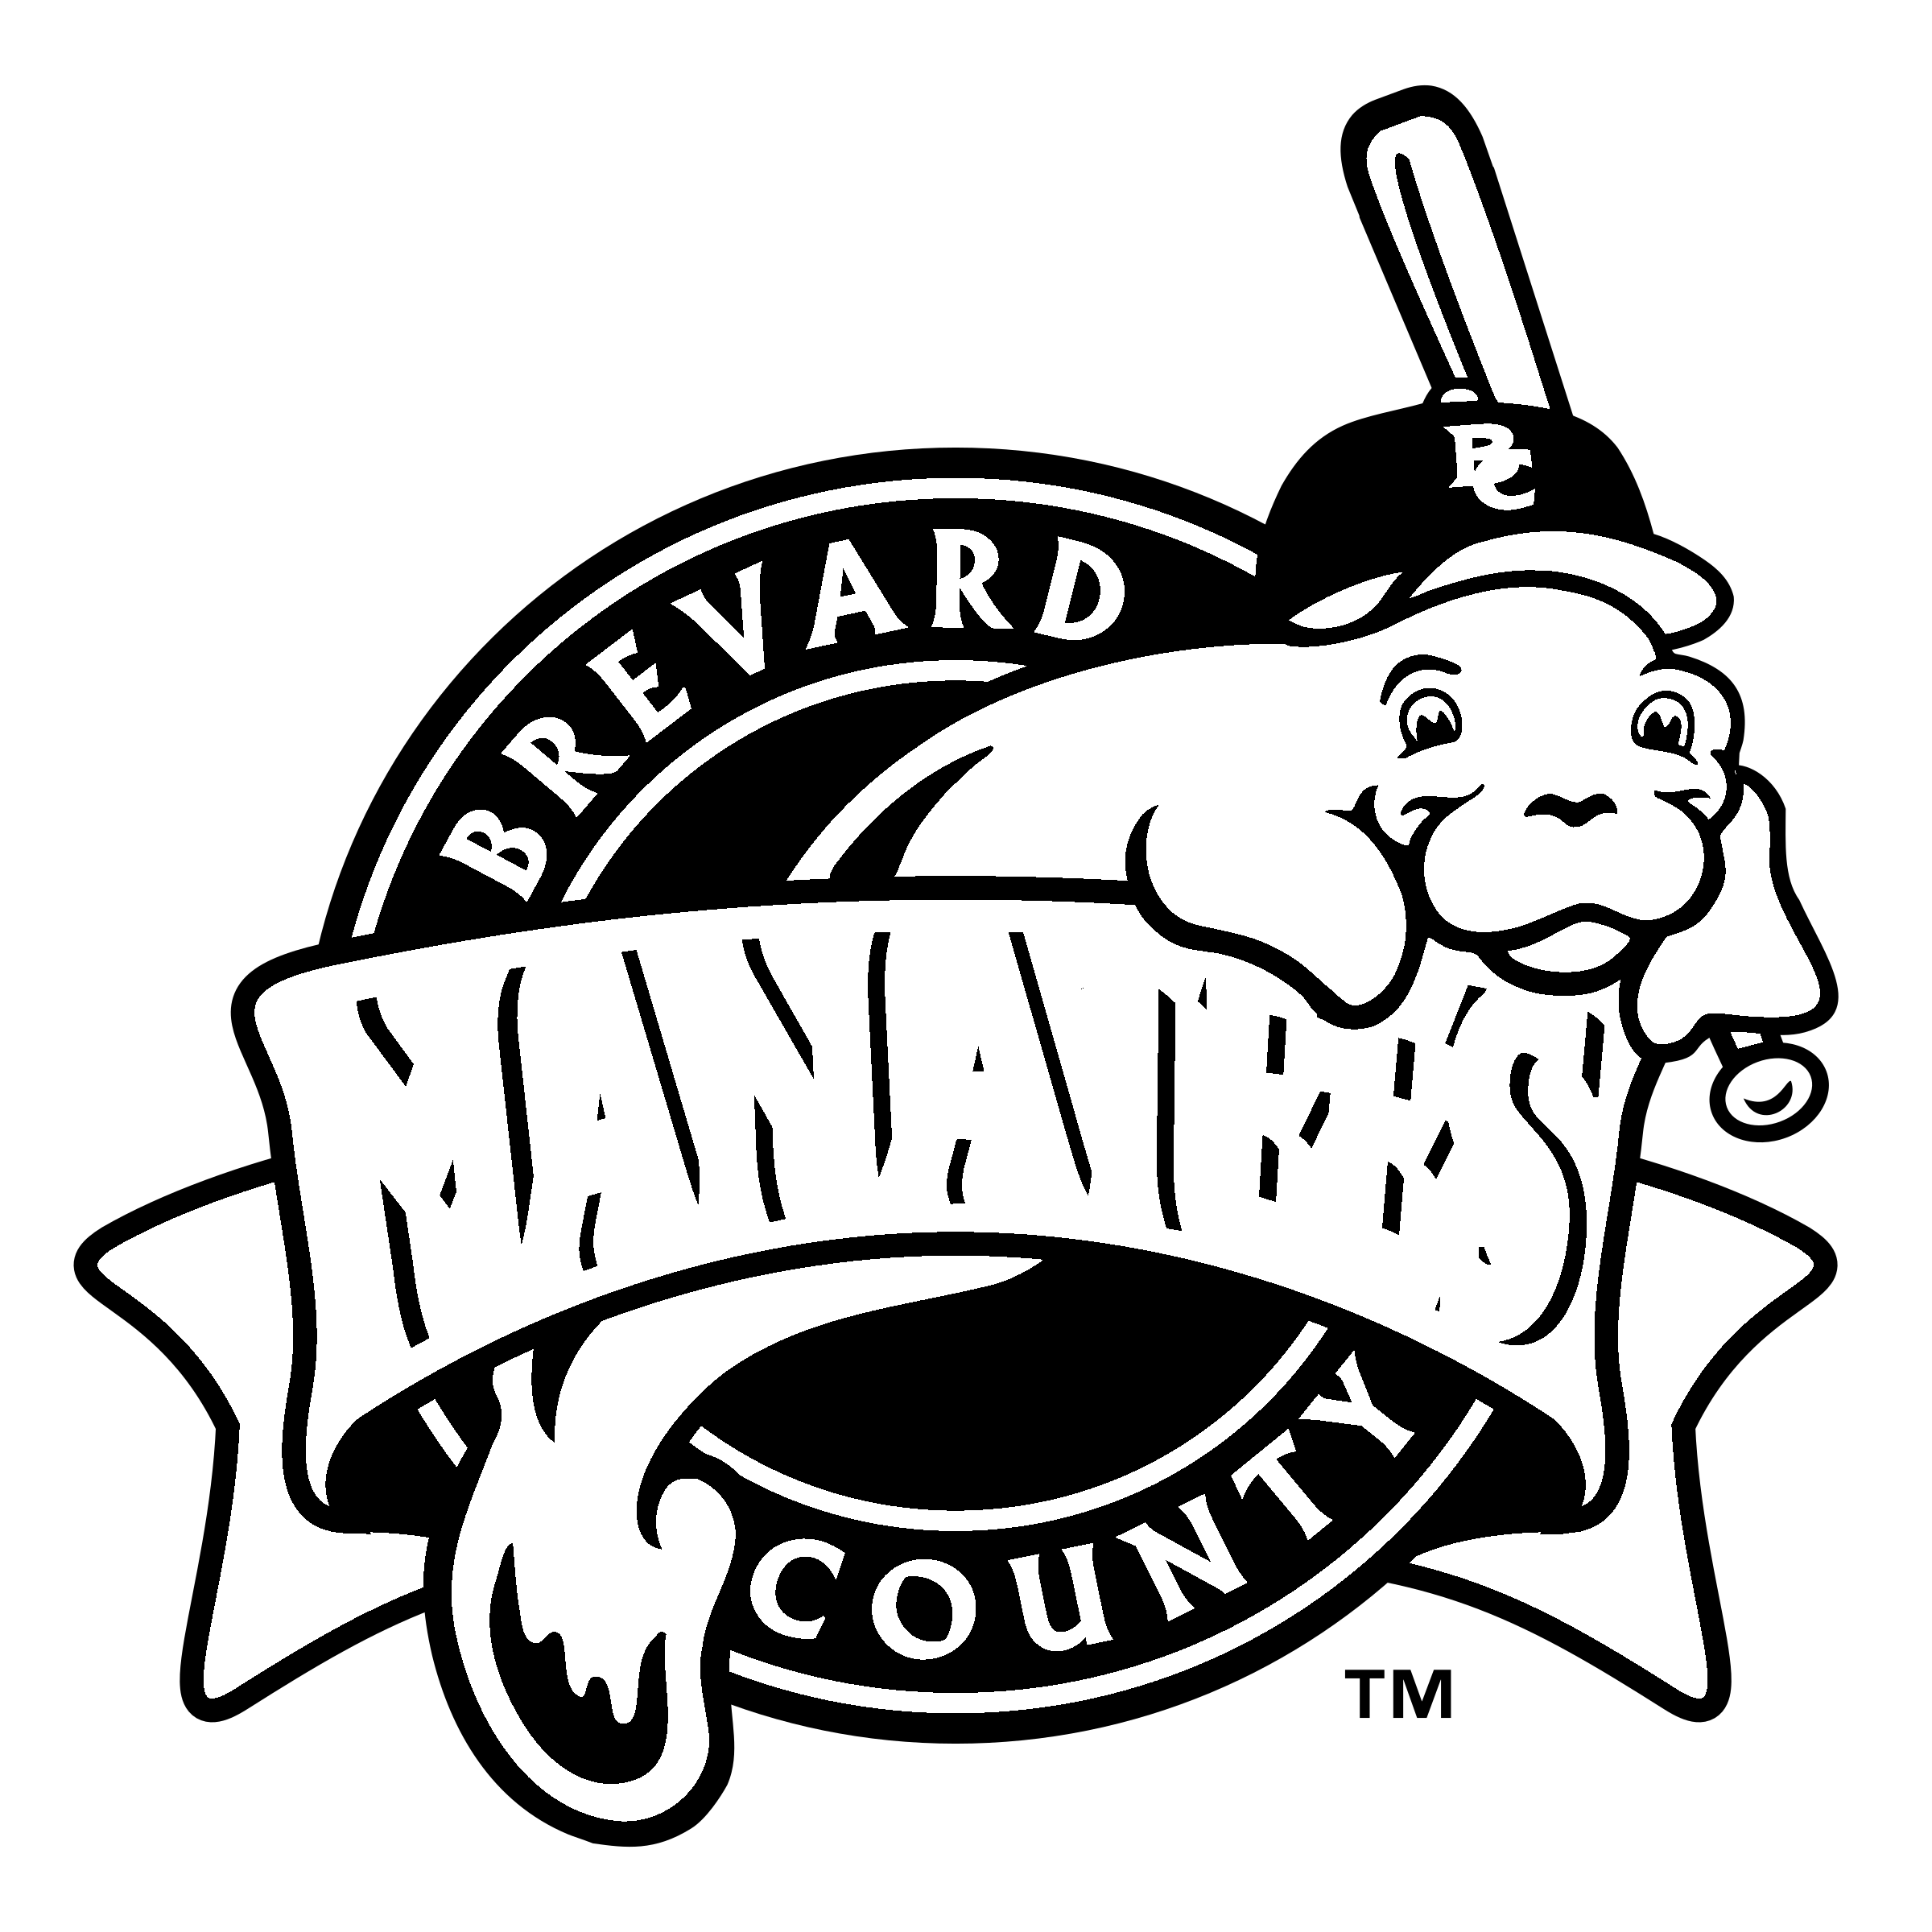 Brevard county manatees logo. Manatee clipart sketch